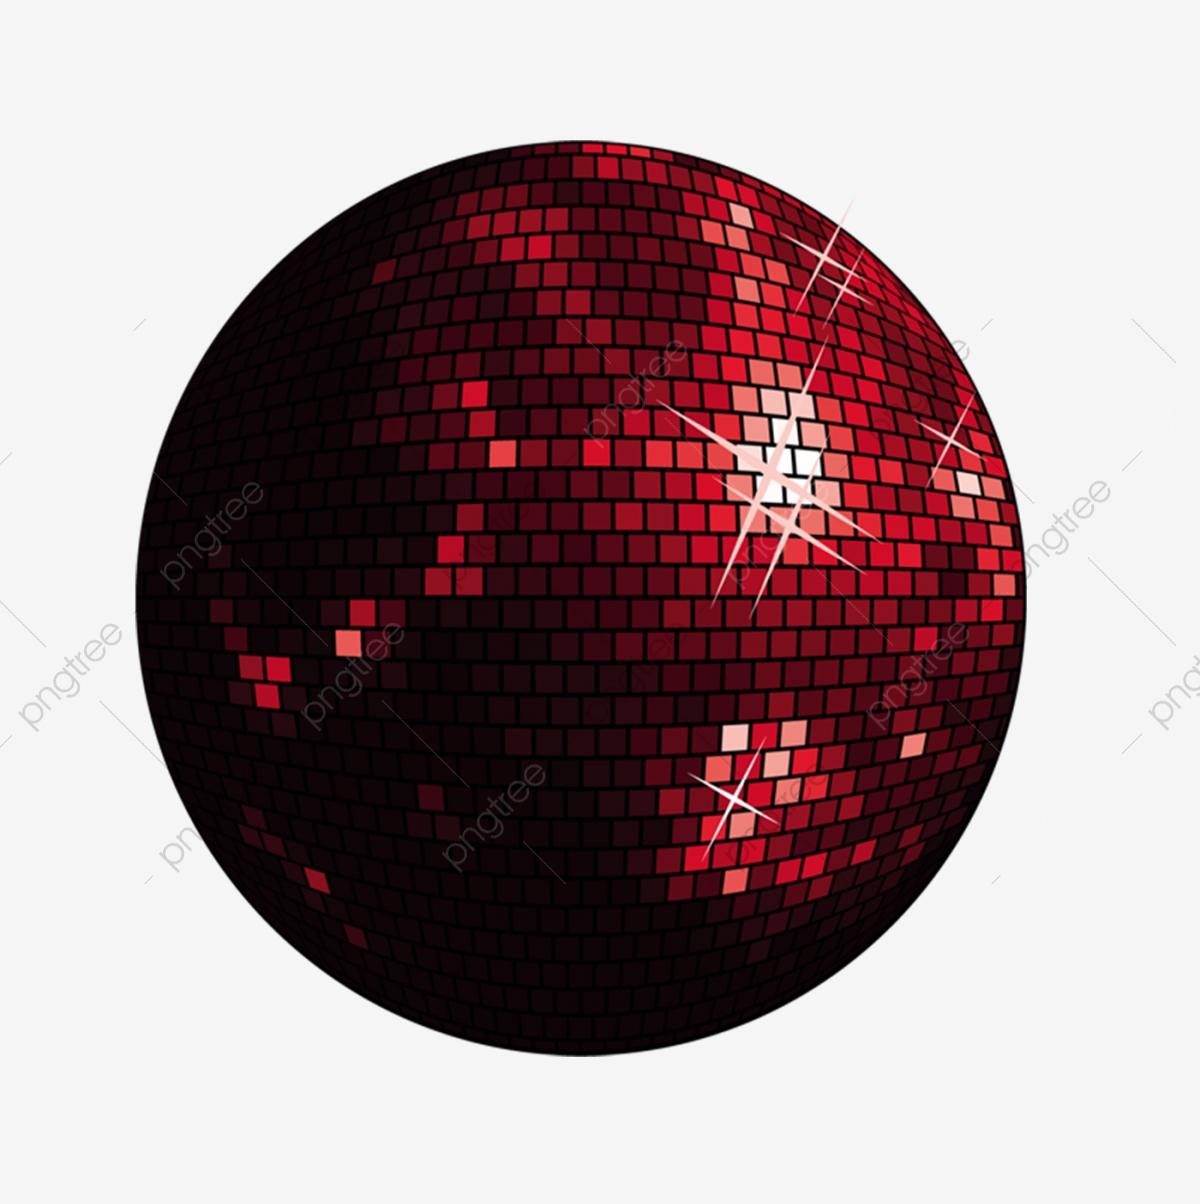 Disco Ball Clip Art, Disco, Disco Ball, Ball PNG Transparent Clipart.